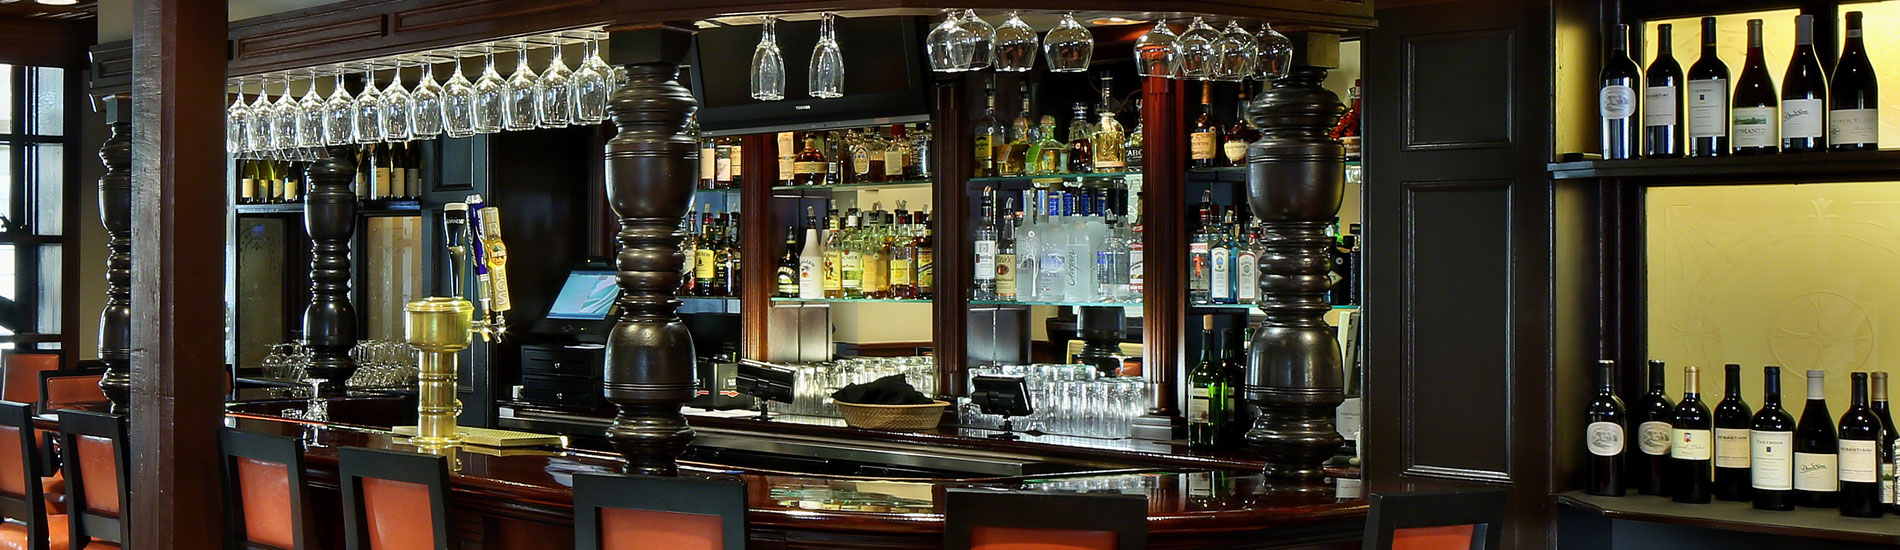 Great Brews & Top Shelf Drinks